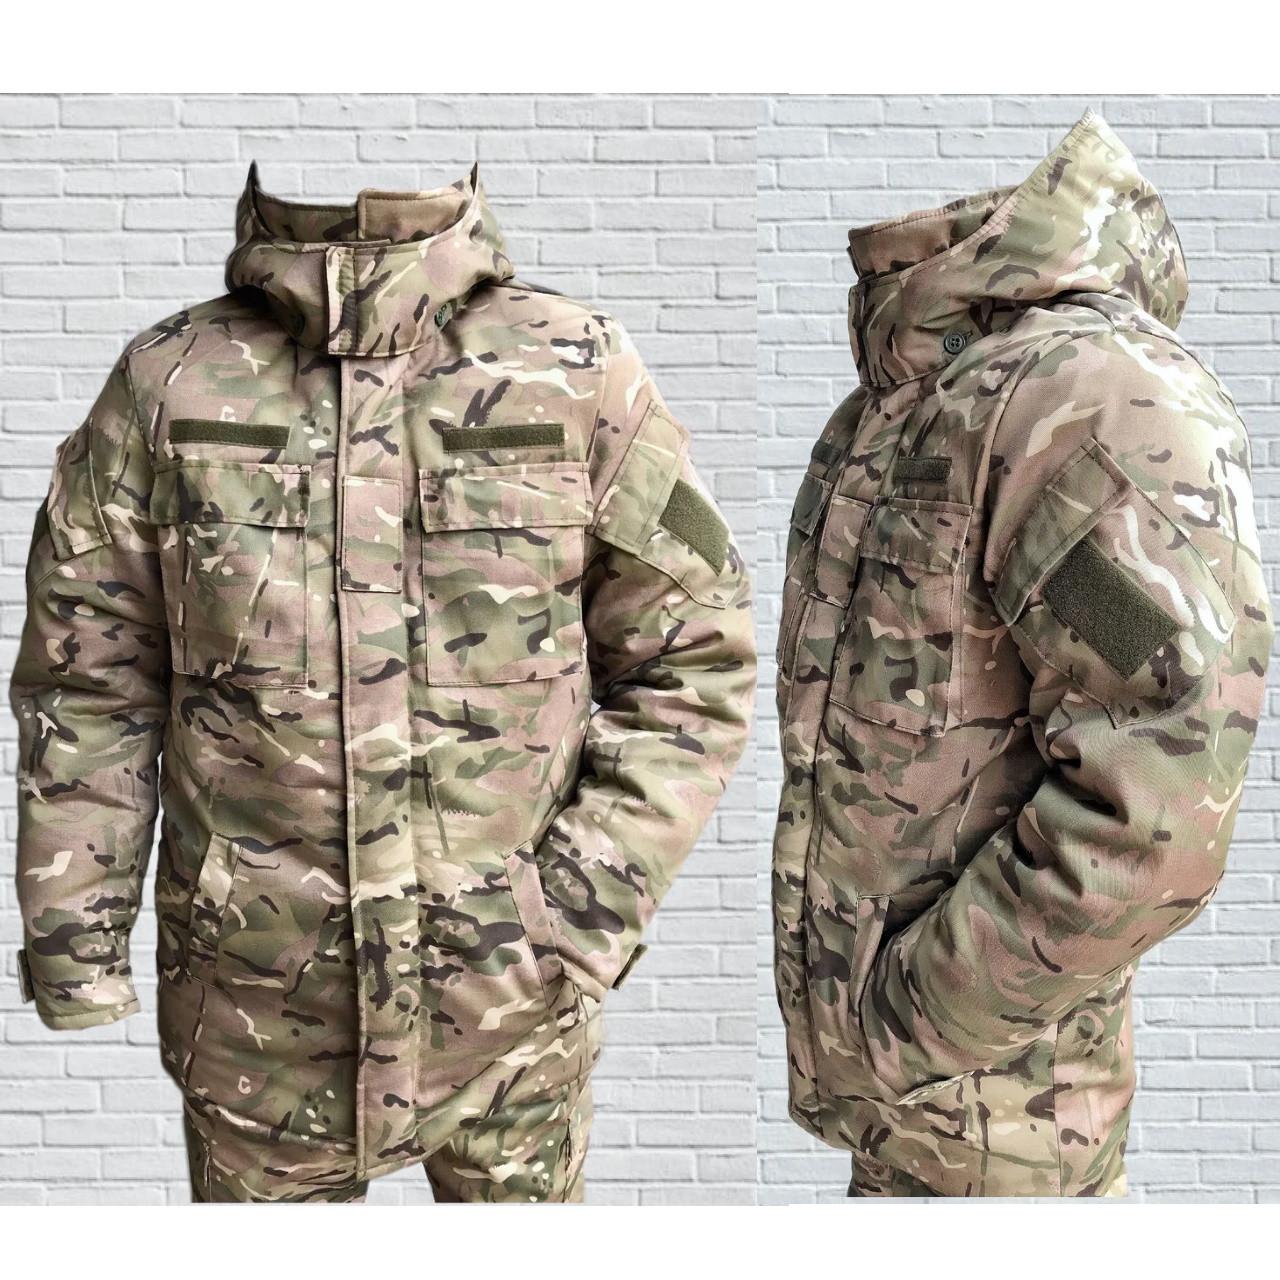 Бушлат зимний камуфляжный армейский Мультикам